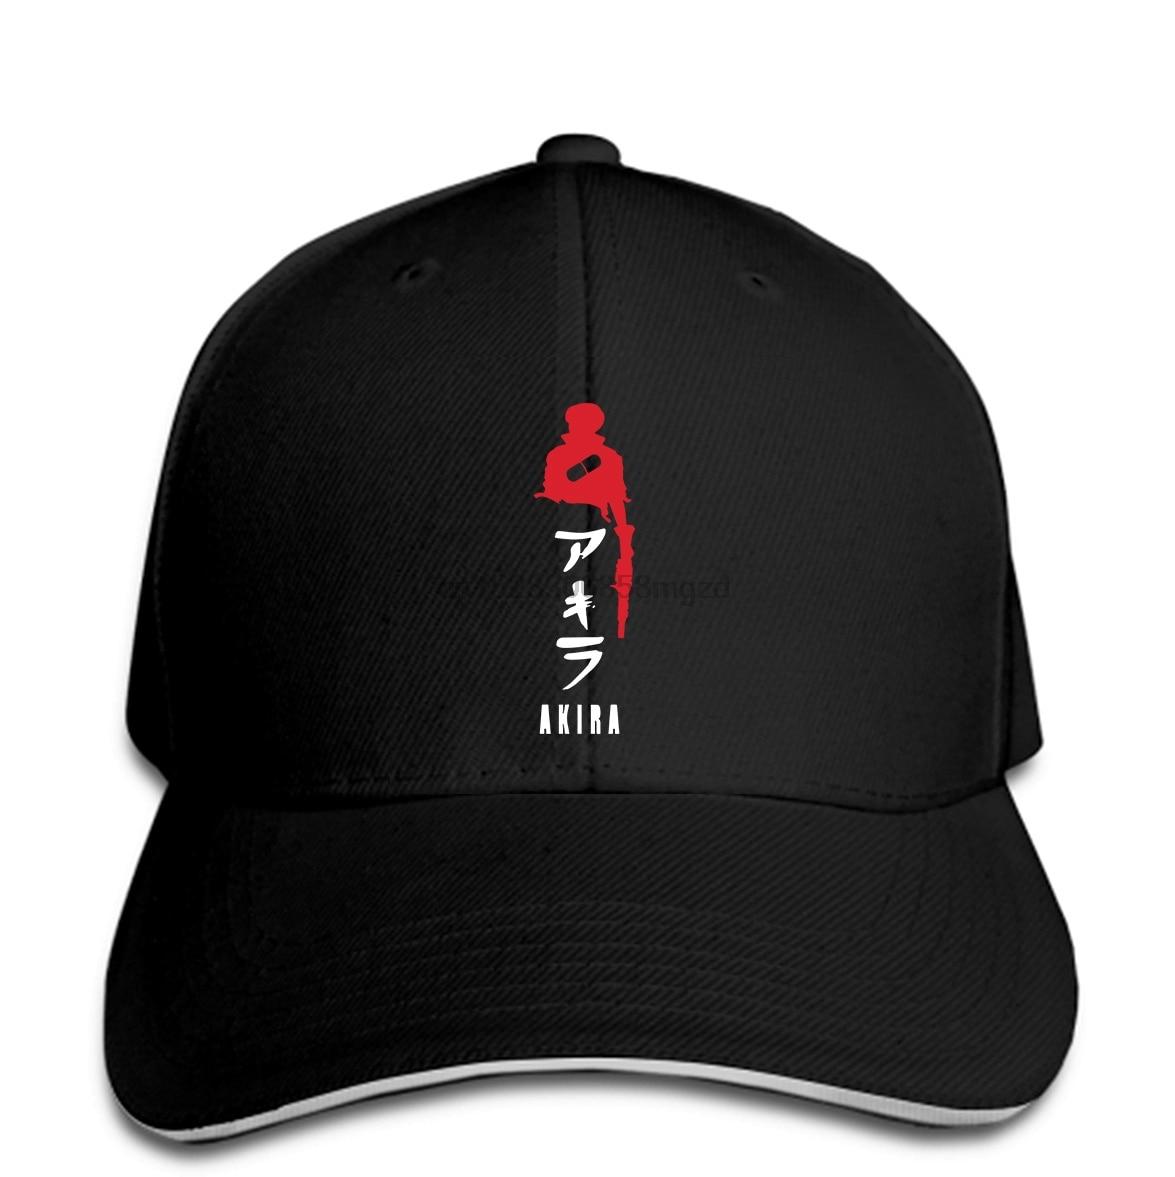 Akira Kaneda rojo y blak art anime manga hombres gorra de béisbol negro gorra Snapback mujeres sombrero pico